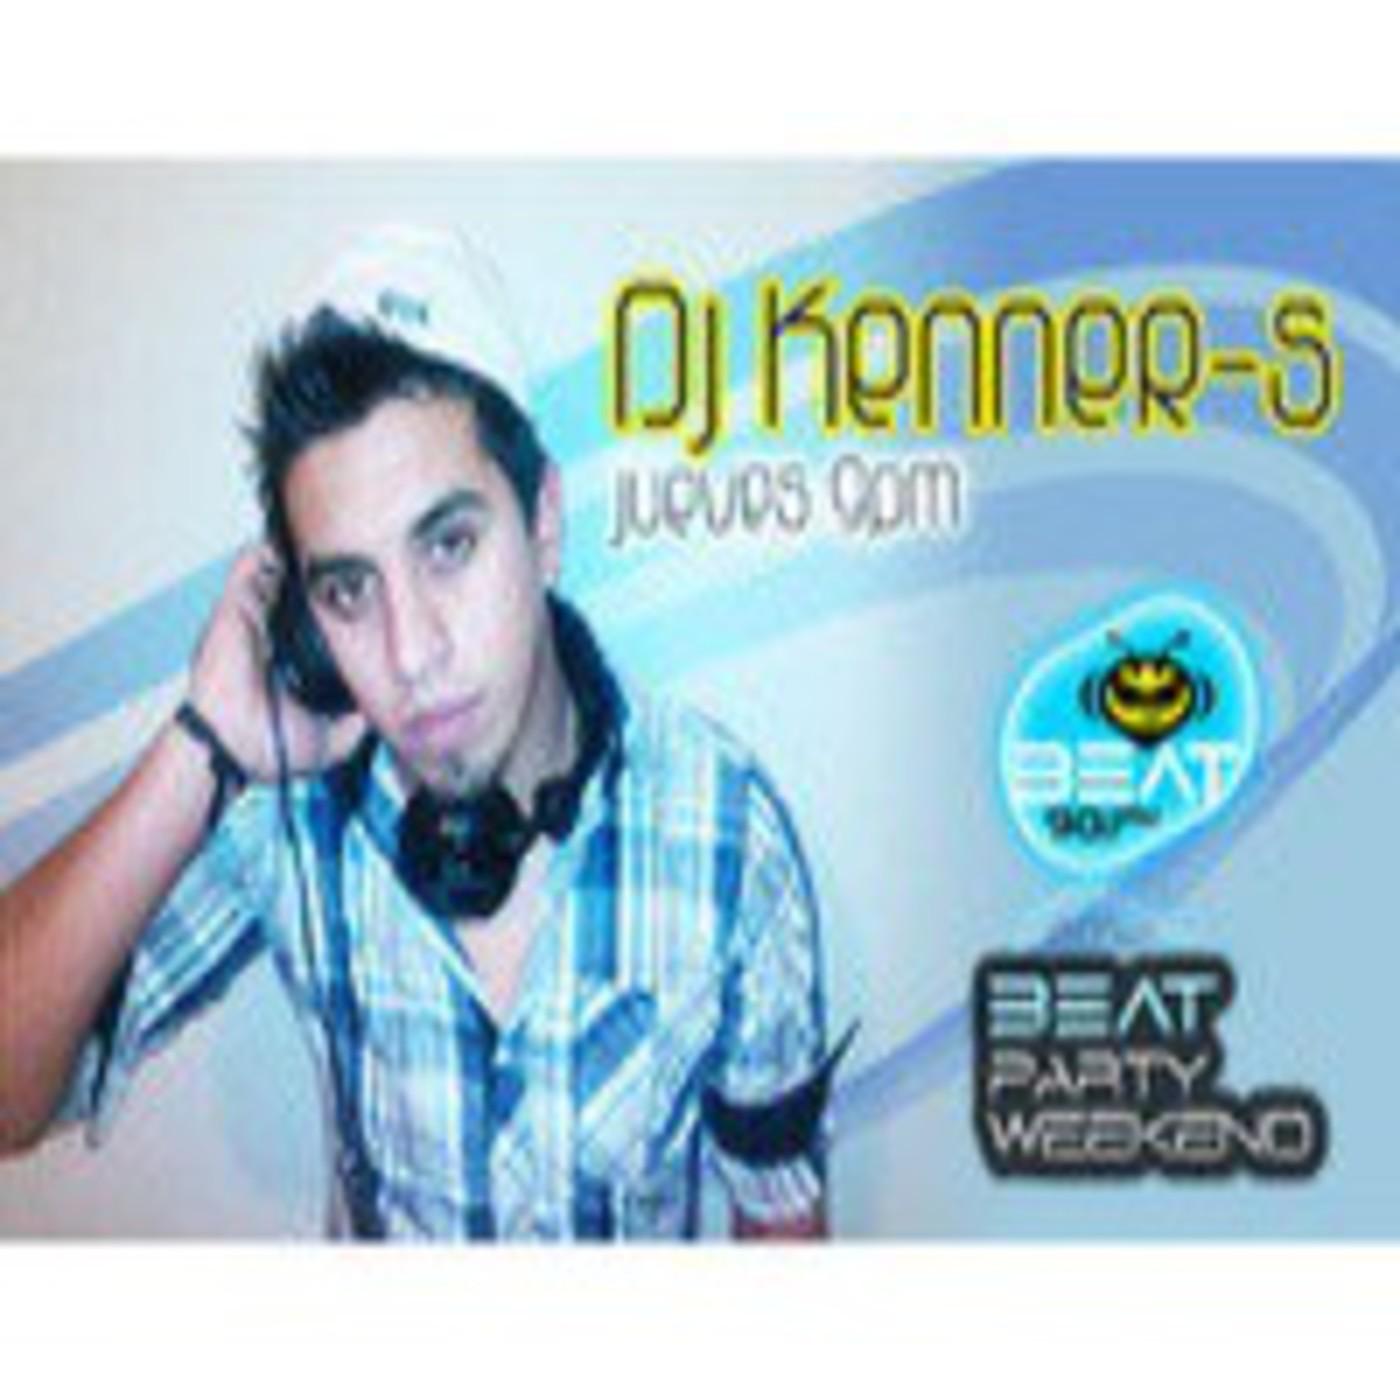 Beat 90.1FM Minimal Set25